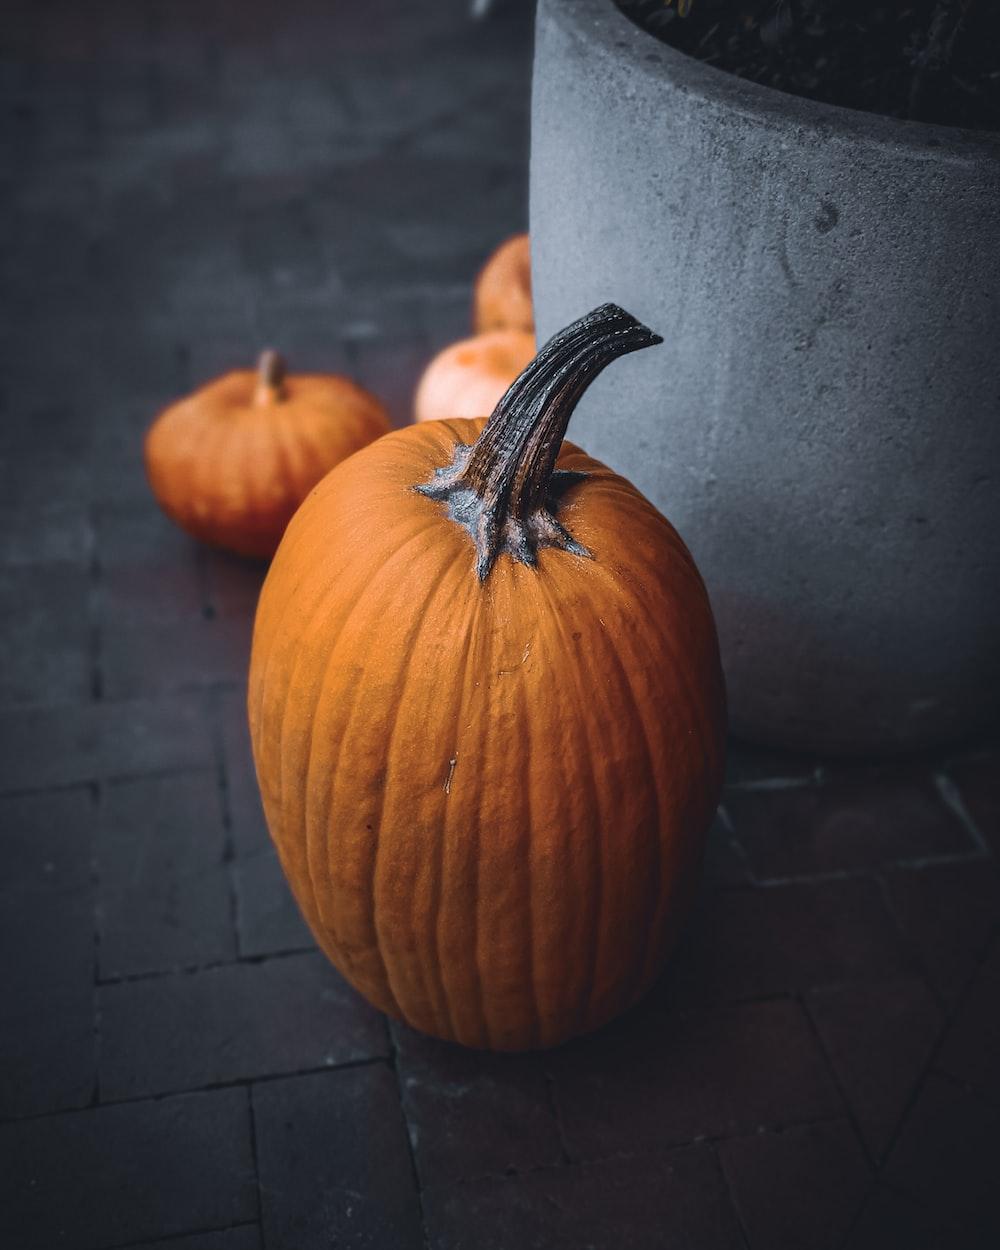 orange pumpkin on brown brick floor